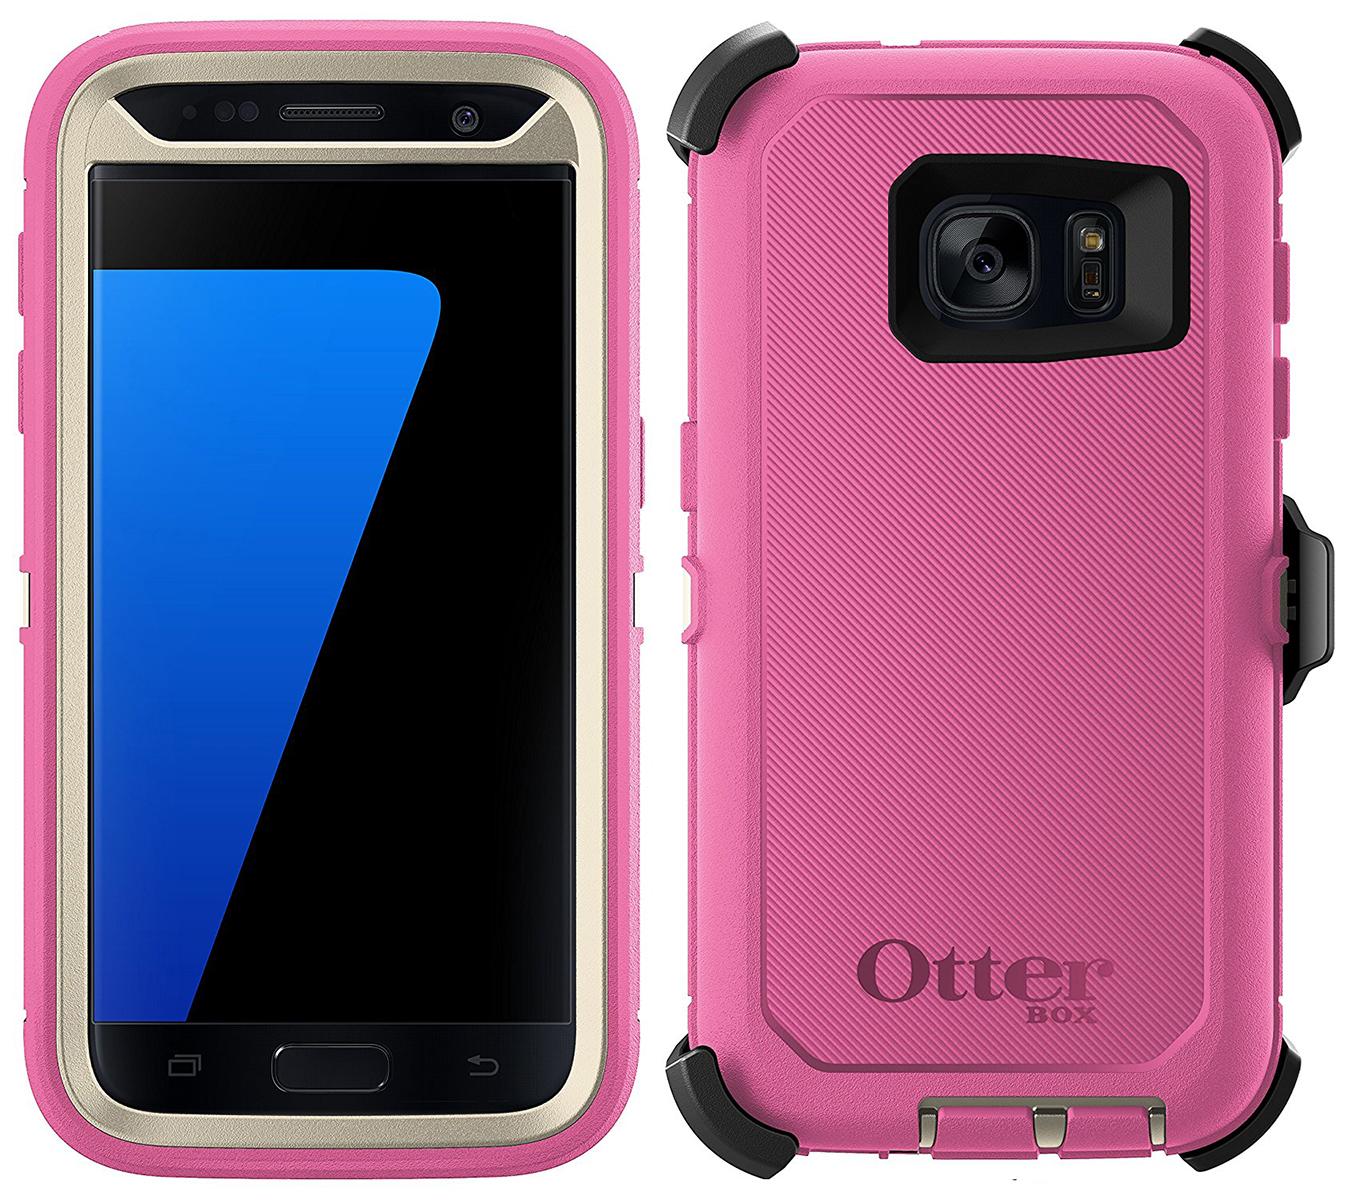 new style c9011 8eb1e Samsung Galaxy S7 OtterBox Defender Series Case - Berries N Cream (Bulk  Packaging)